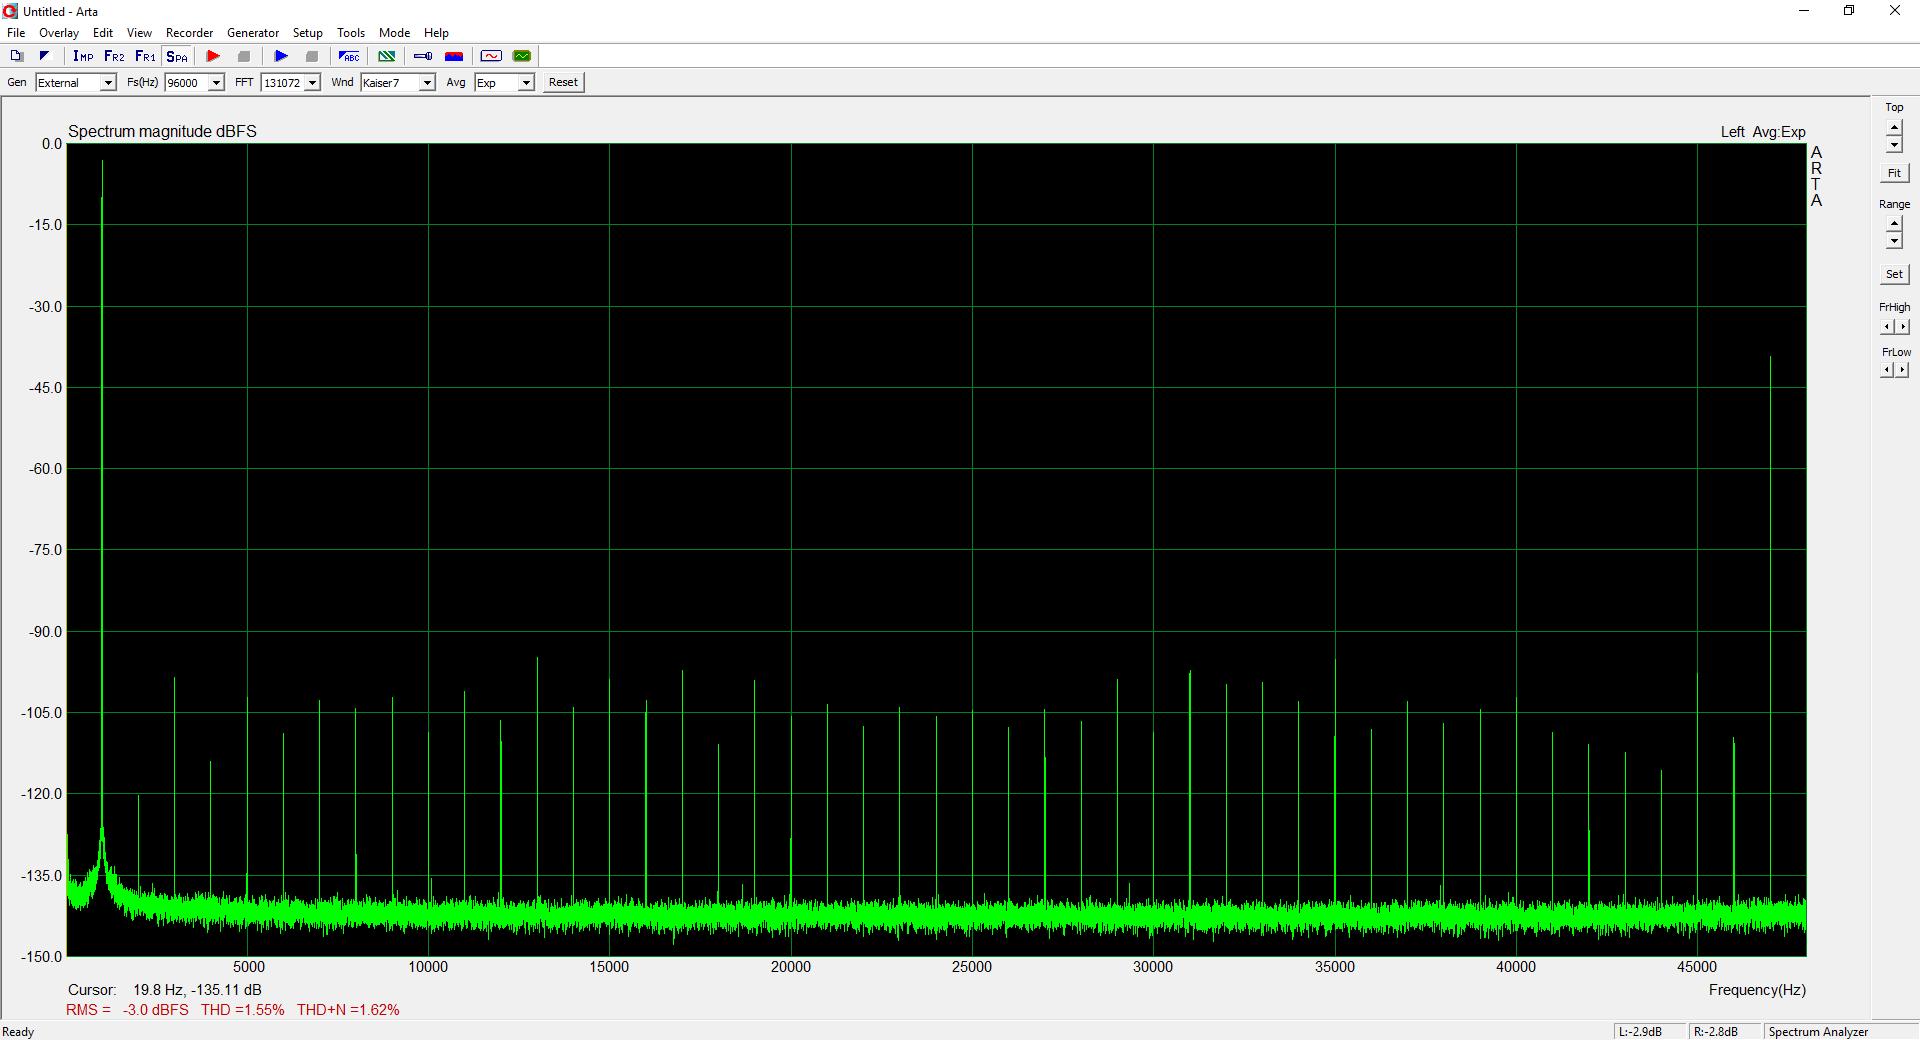 2 Menuet - 16 48 - 1k -3dB Long Spectrum.PNG